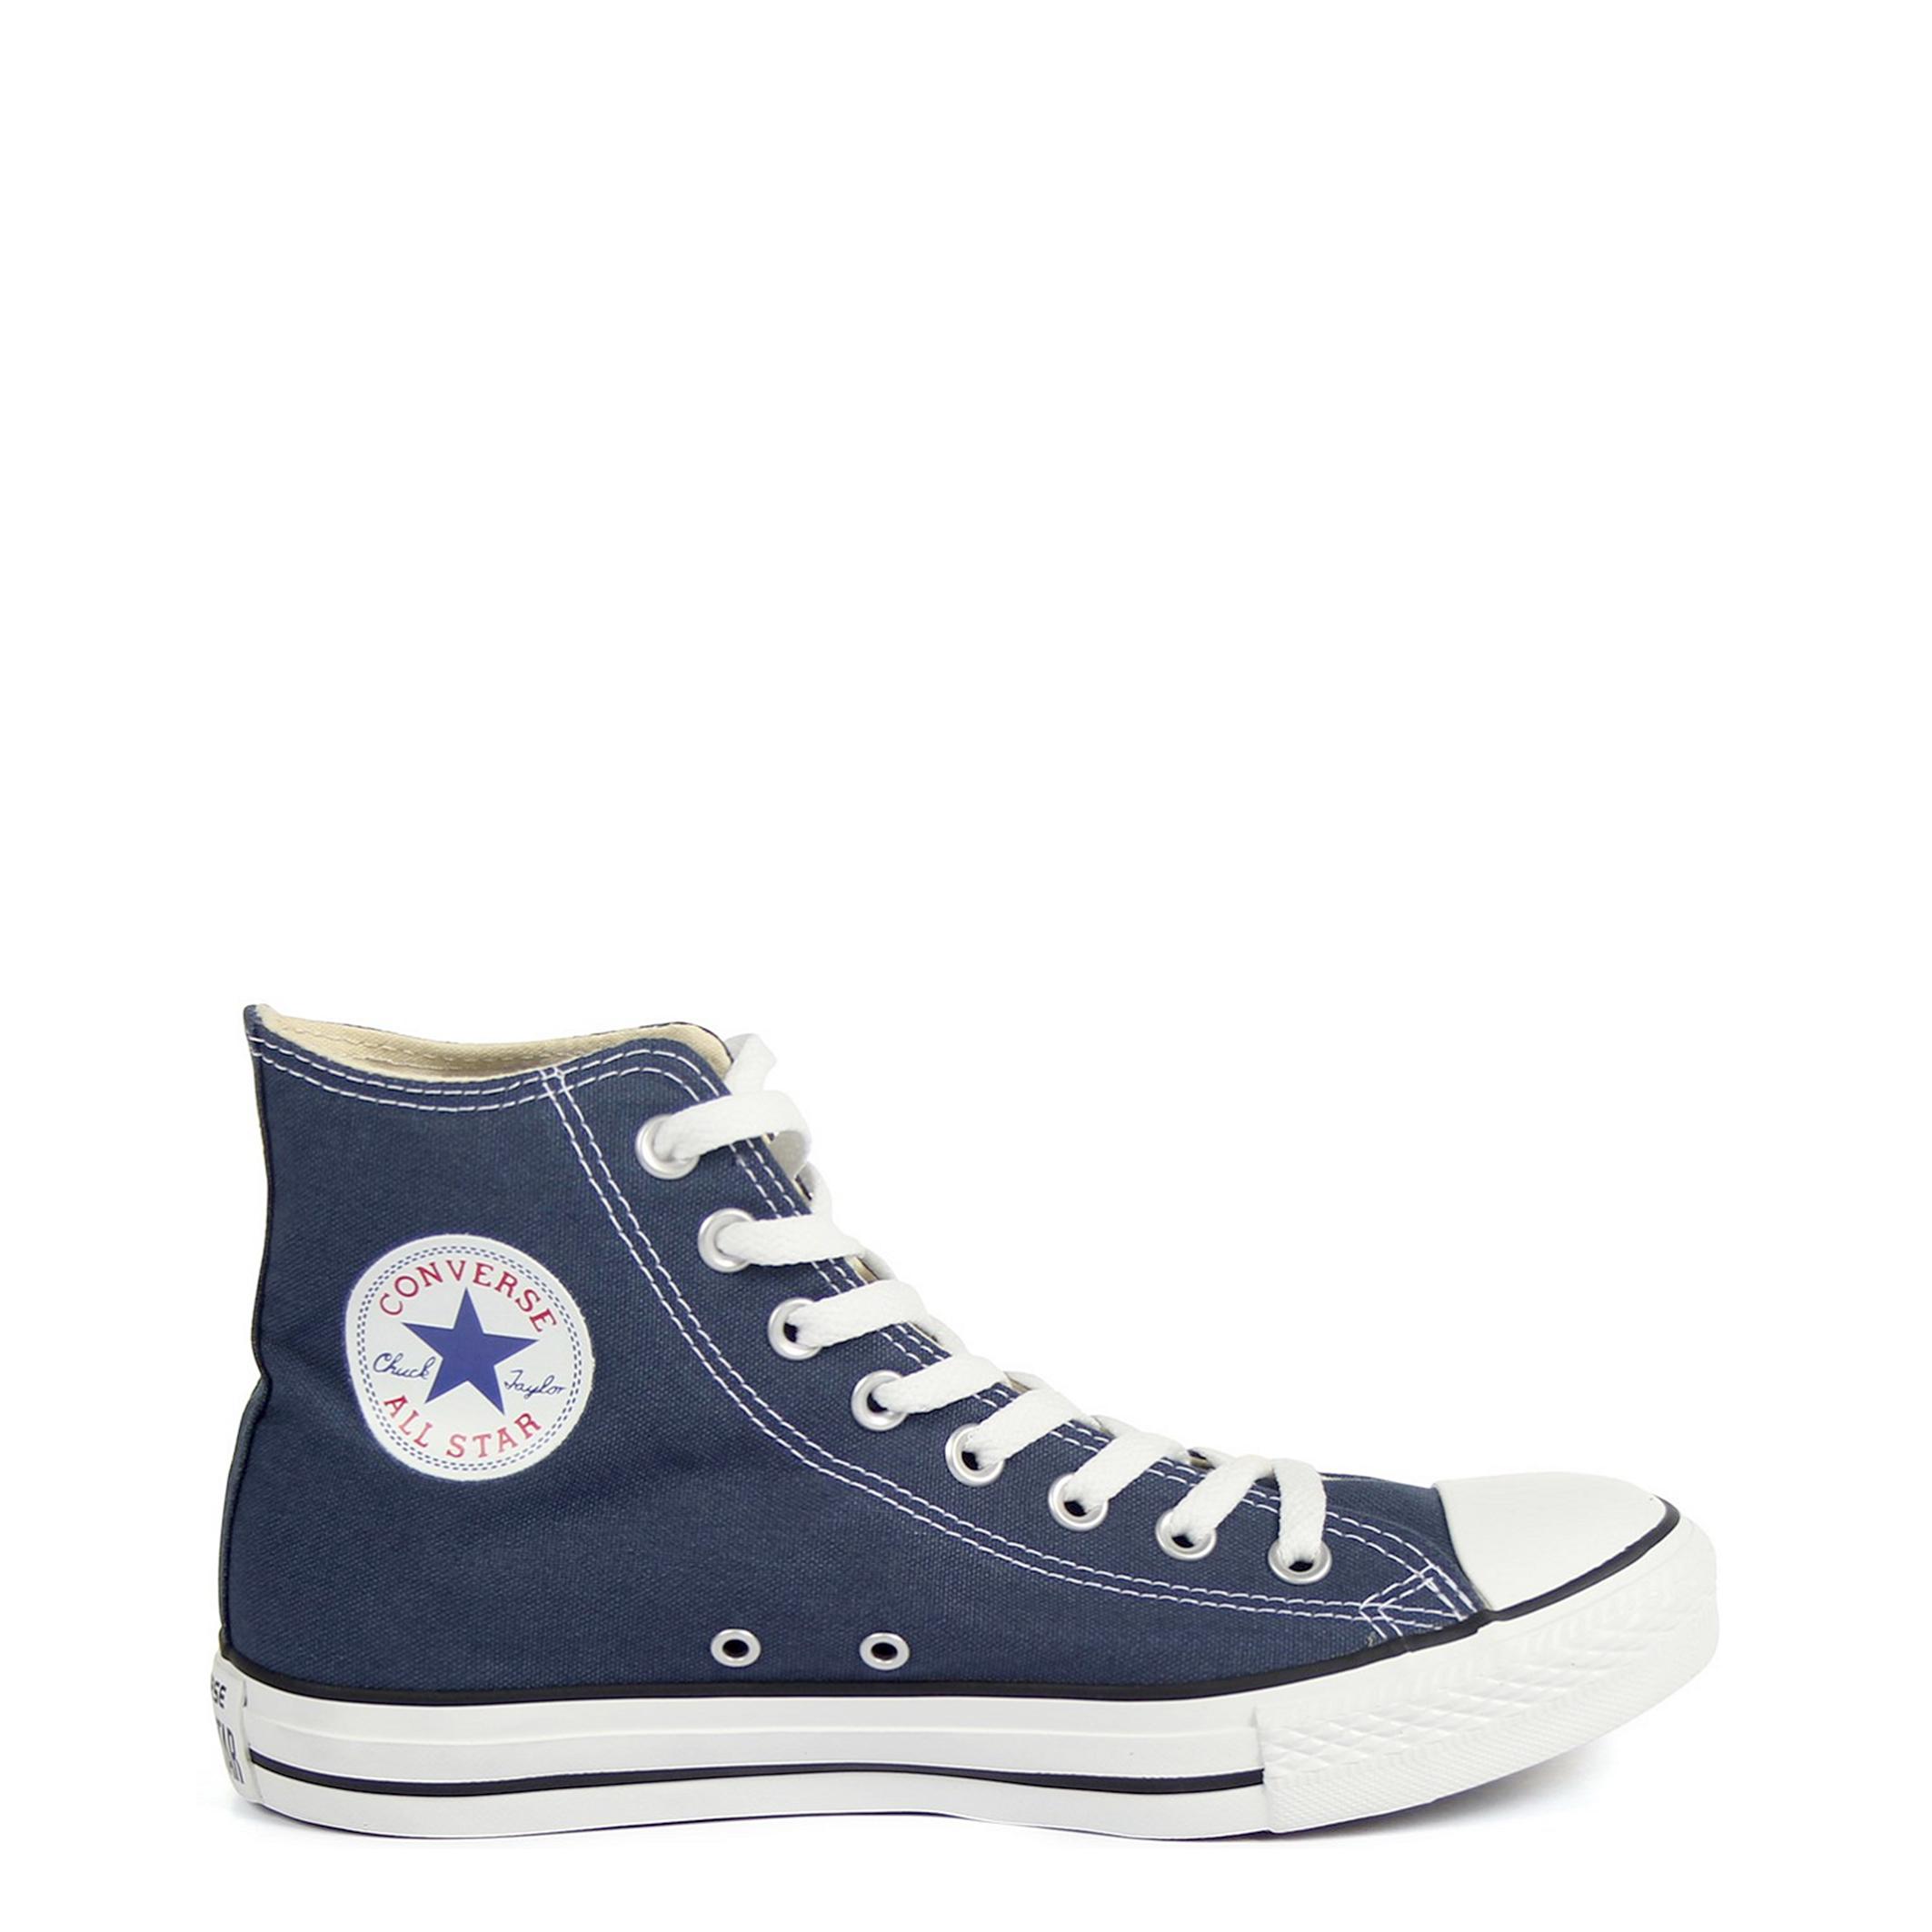 Baskets / Sport  Converse M9622 blue